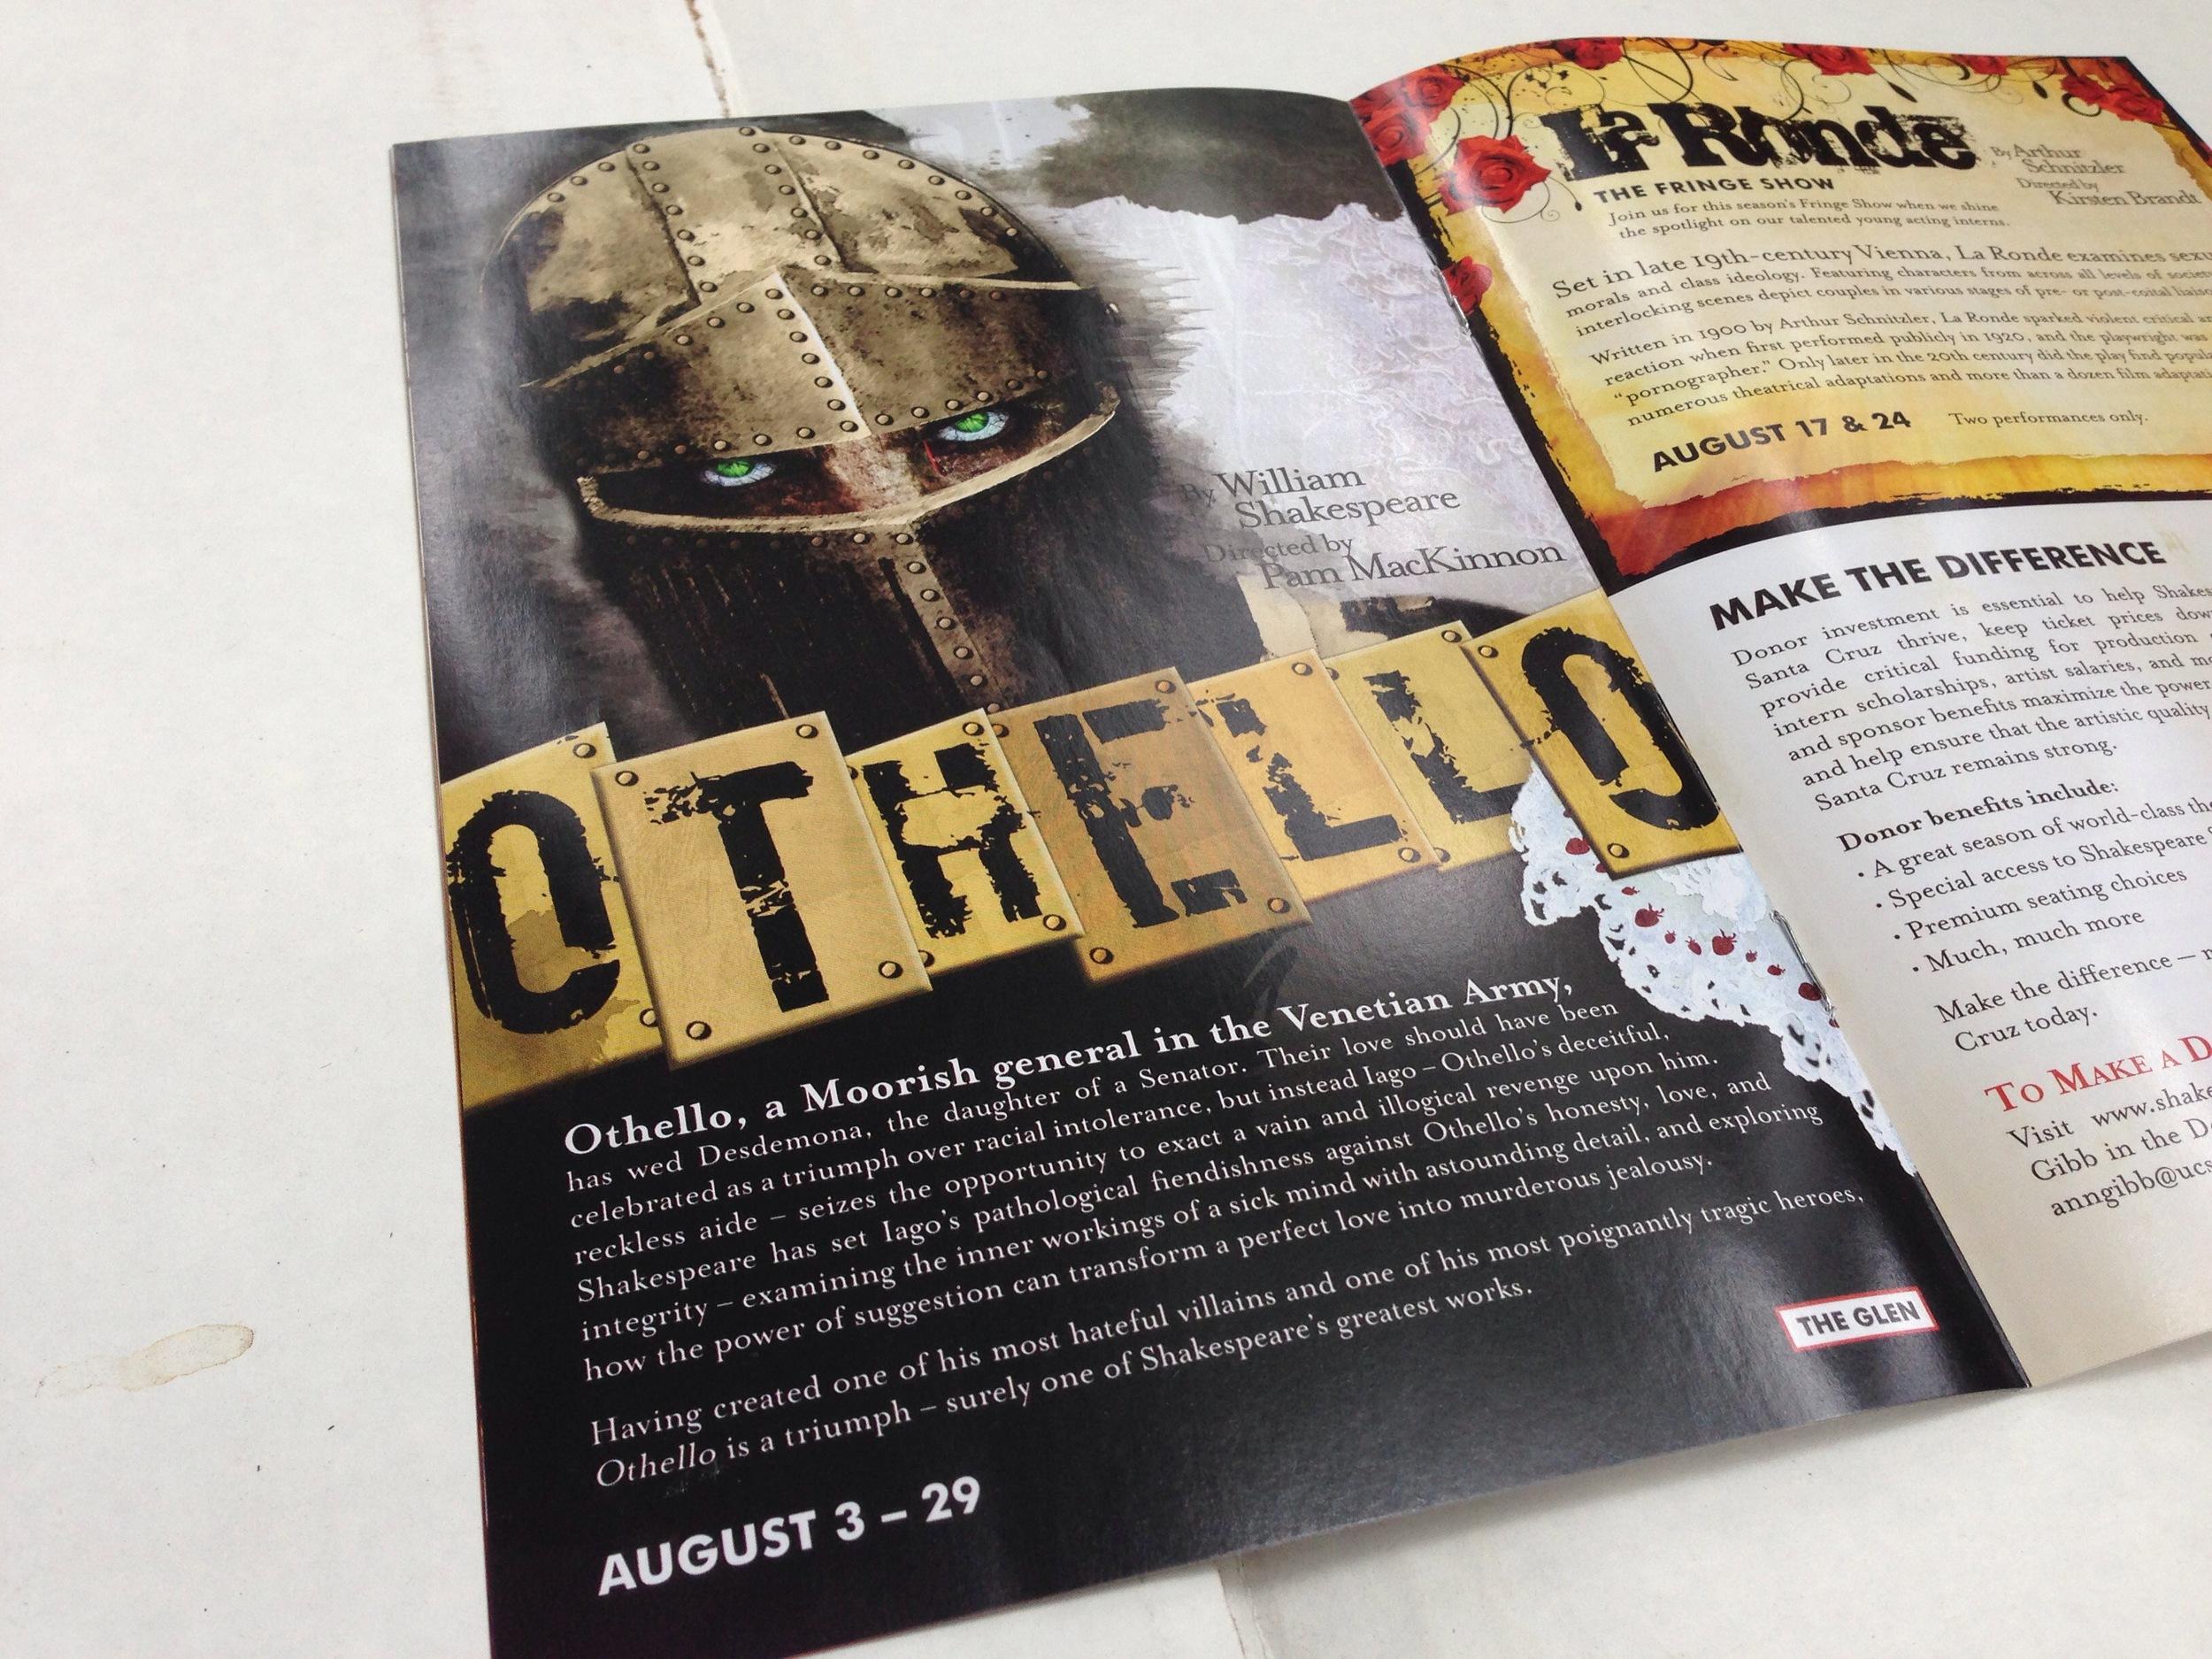 Shakespeare Santa Cruz - Othello